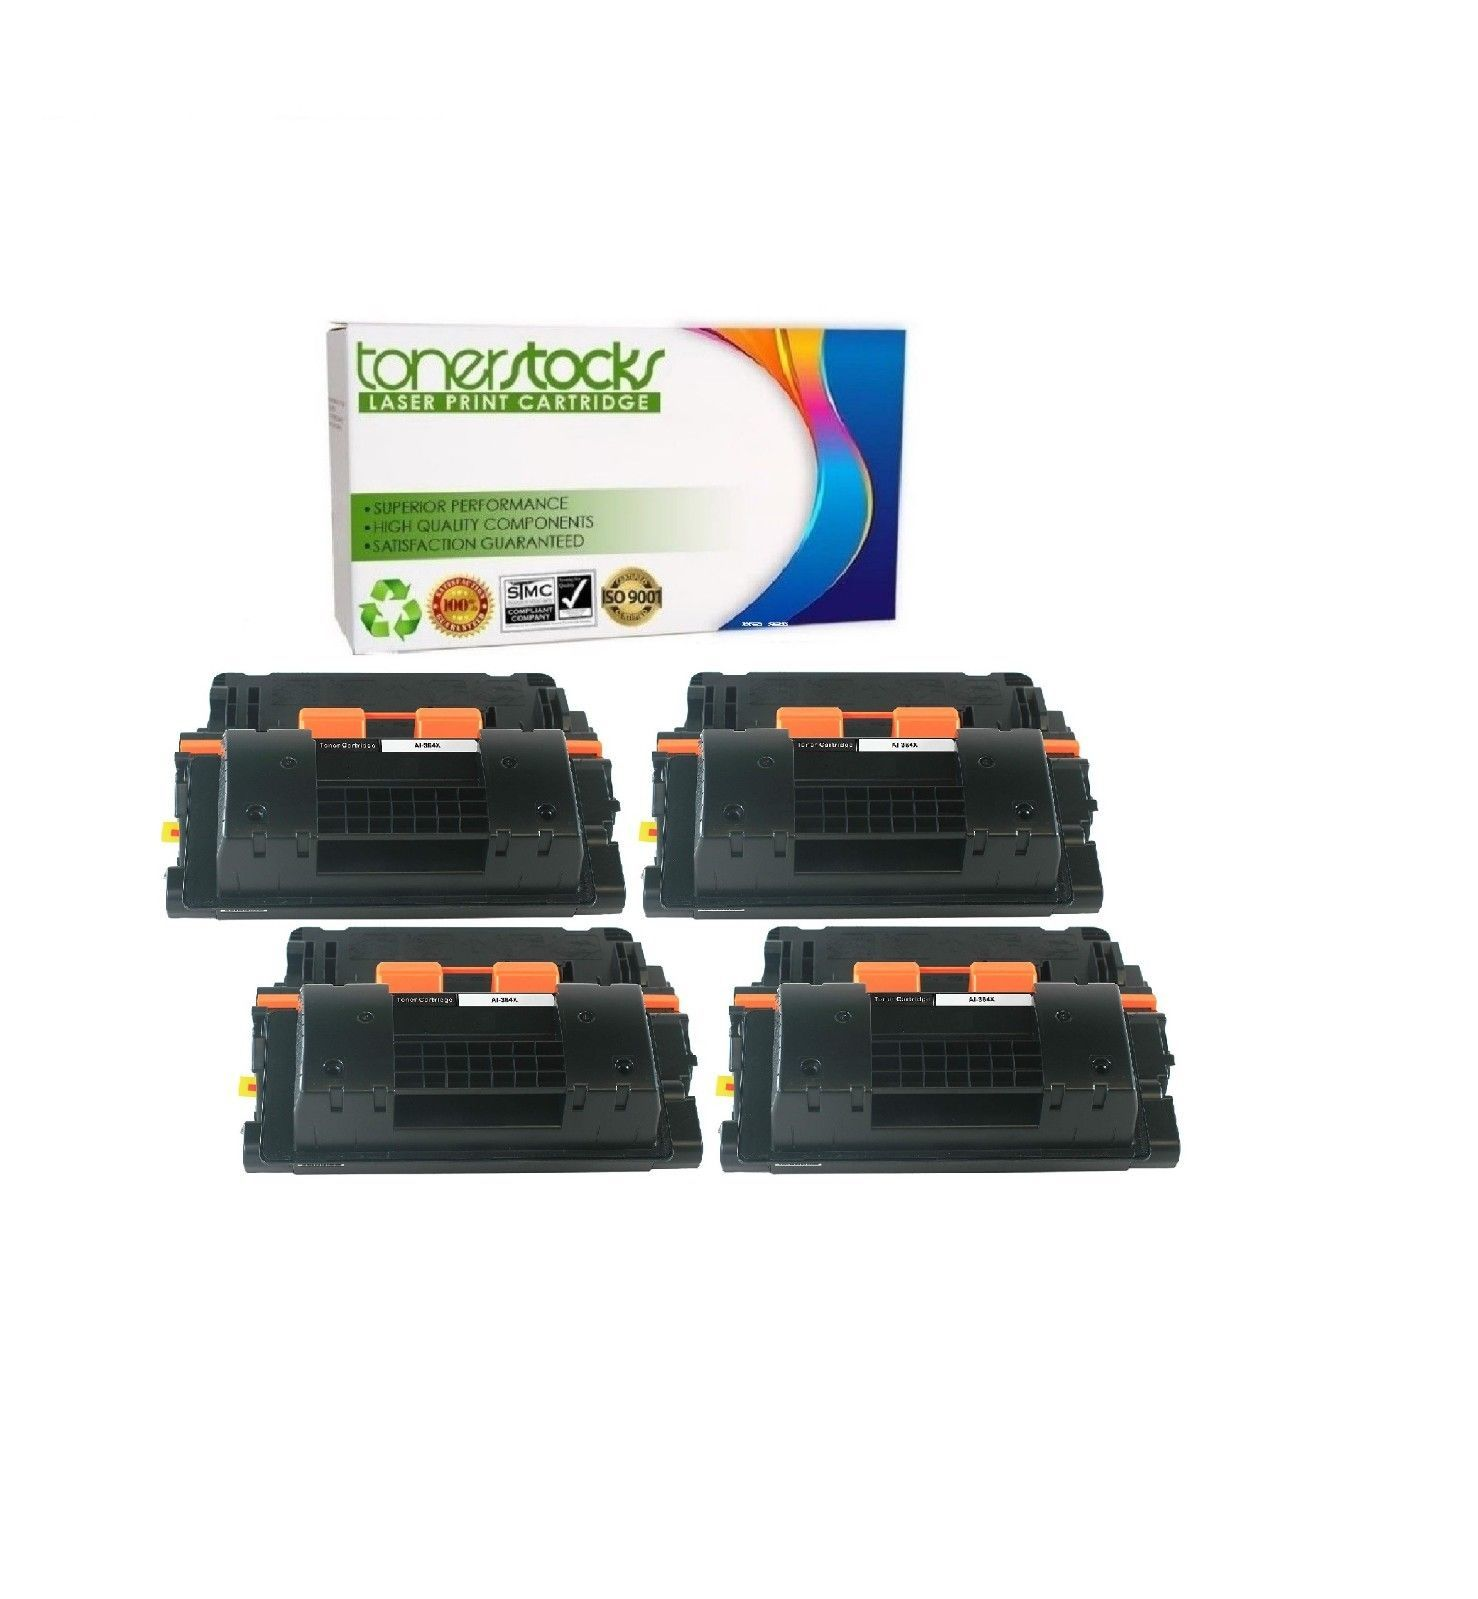 10PK High Yield CC364X 64X Toner Cartridge For HP LaserJet P4015 P4515 P4515TN